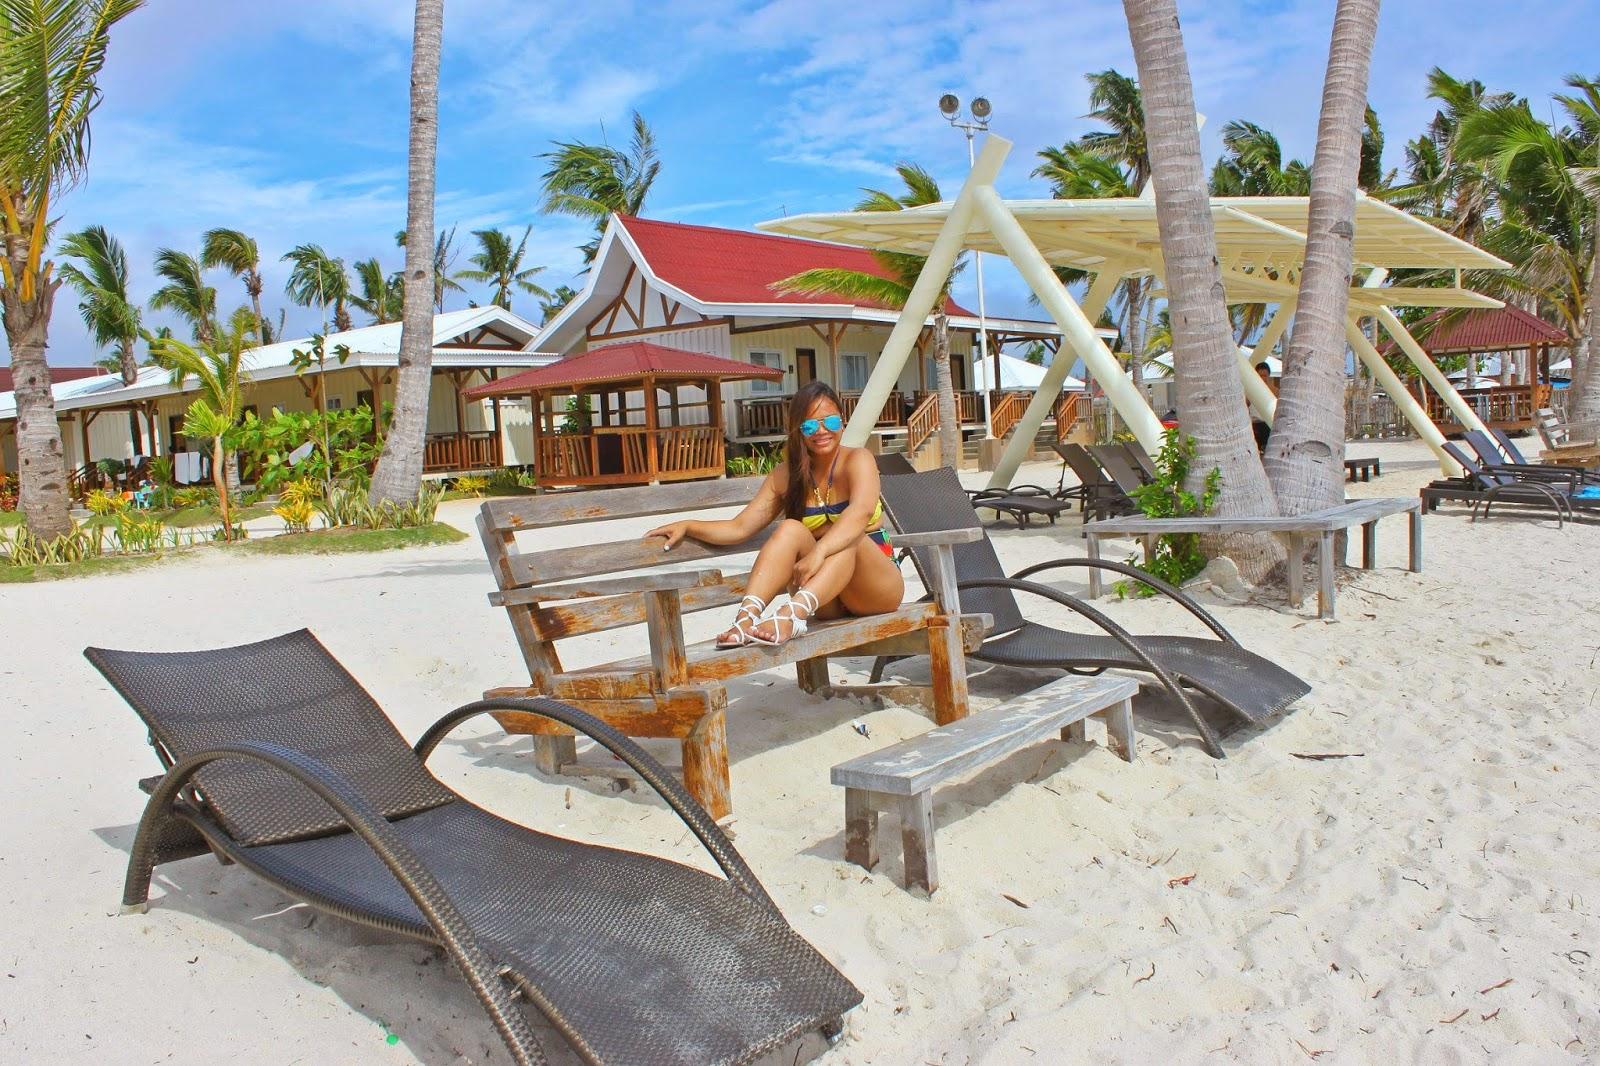 Beachtraveler Bantayan Island After Typhoon Haiyan